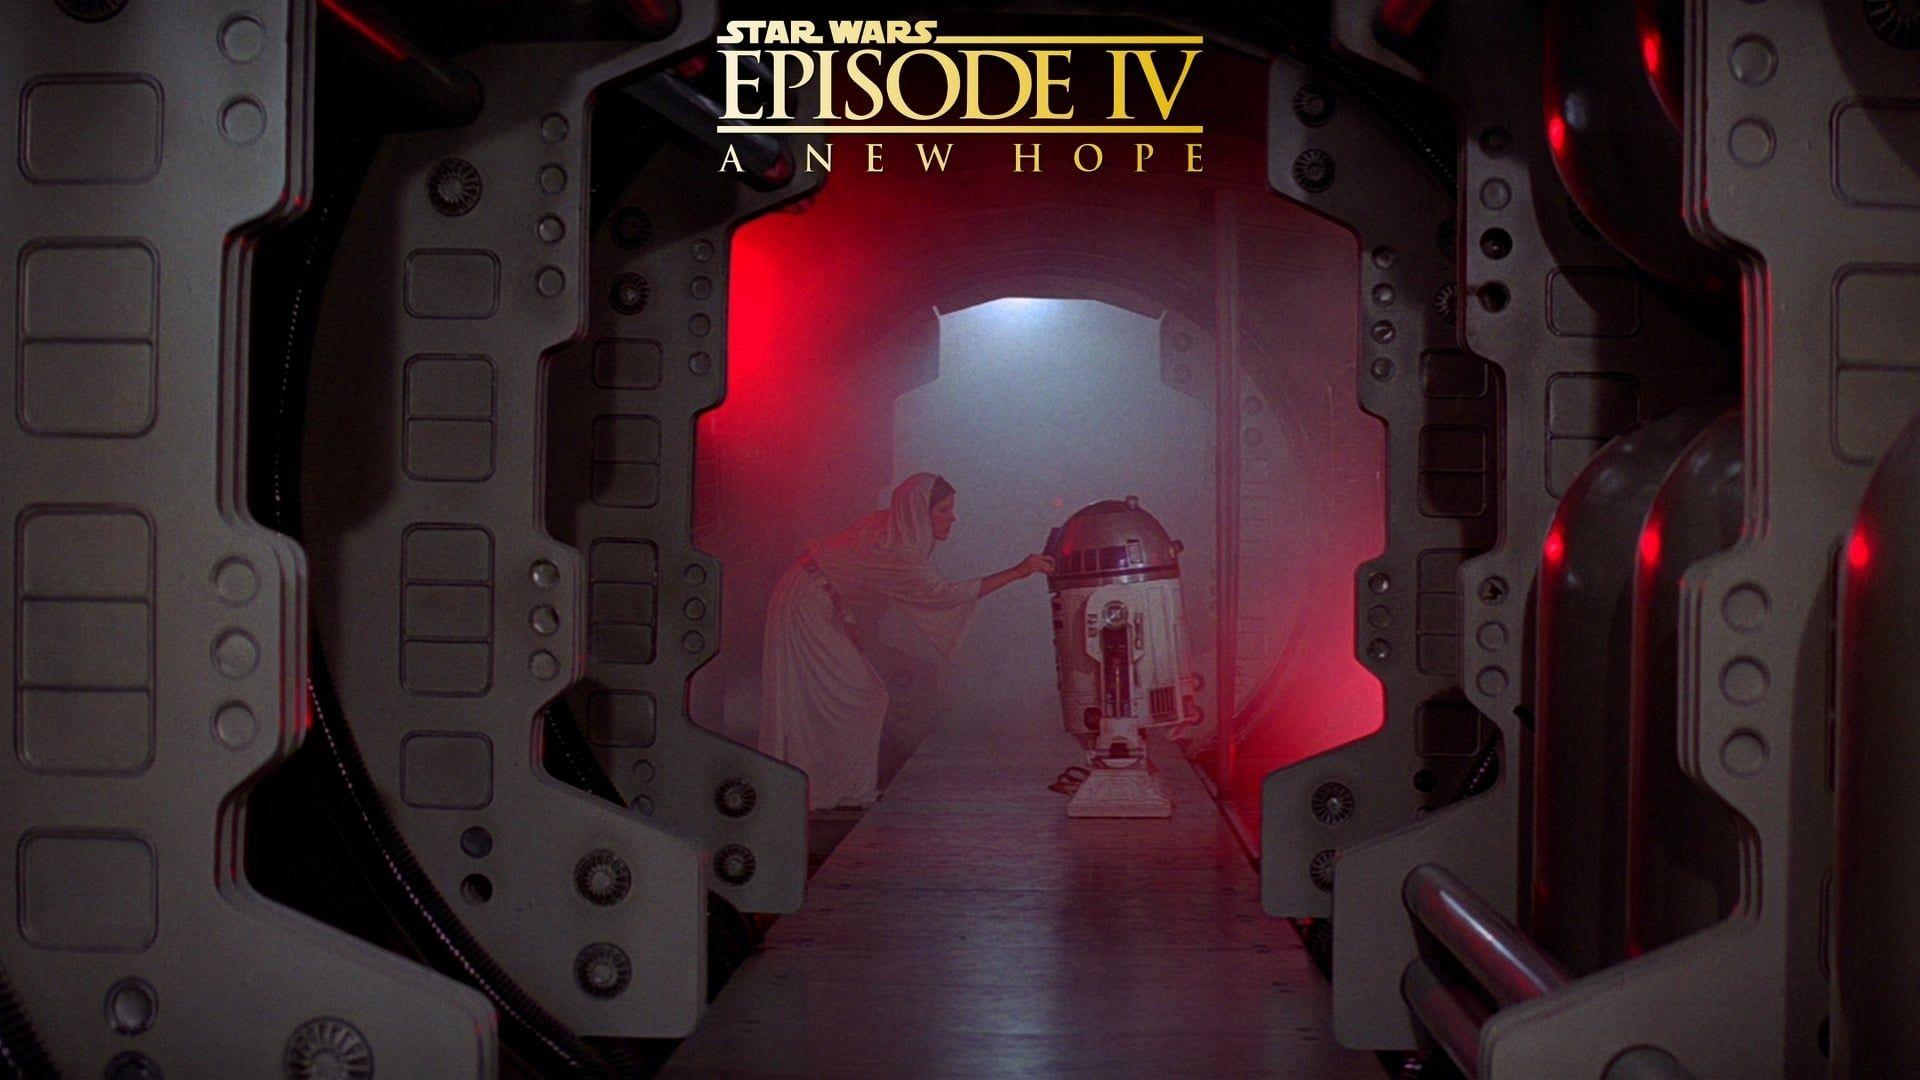 Star Wars Episode Iv A New Hope 1977 Putlocker Film Complet Streaming Luke Skywalker Werkt Op Het Land B Star Wars Film Star Wars 1977 Star Wars Watch